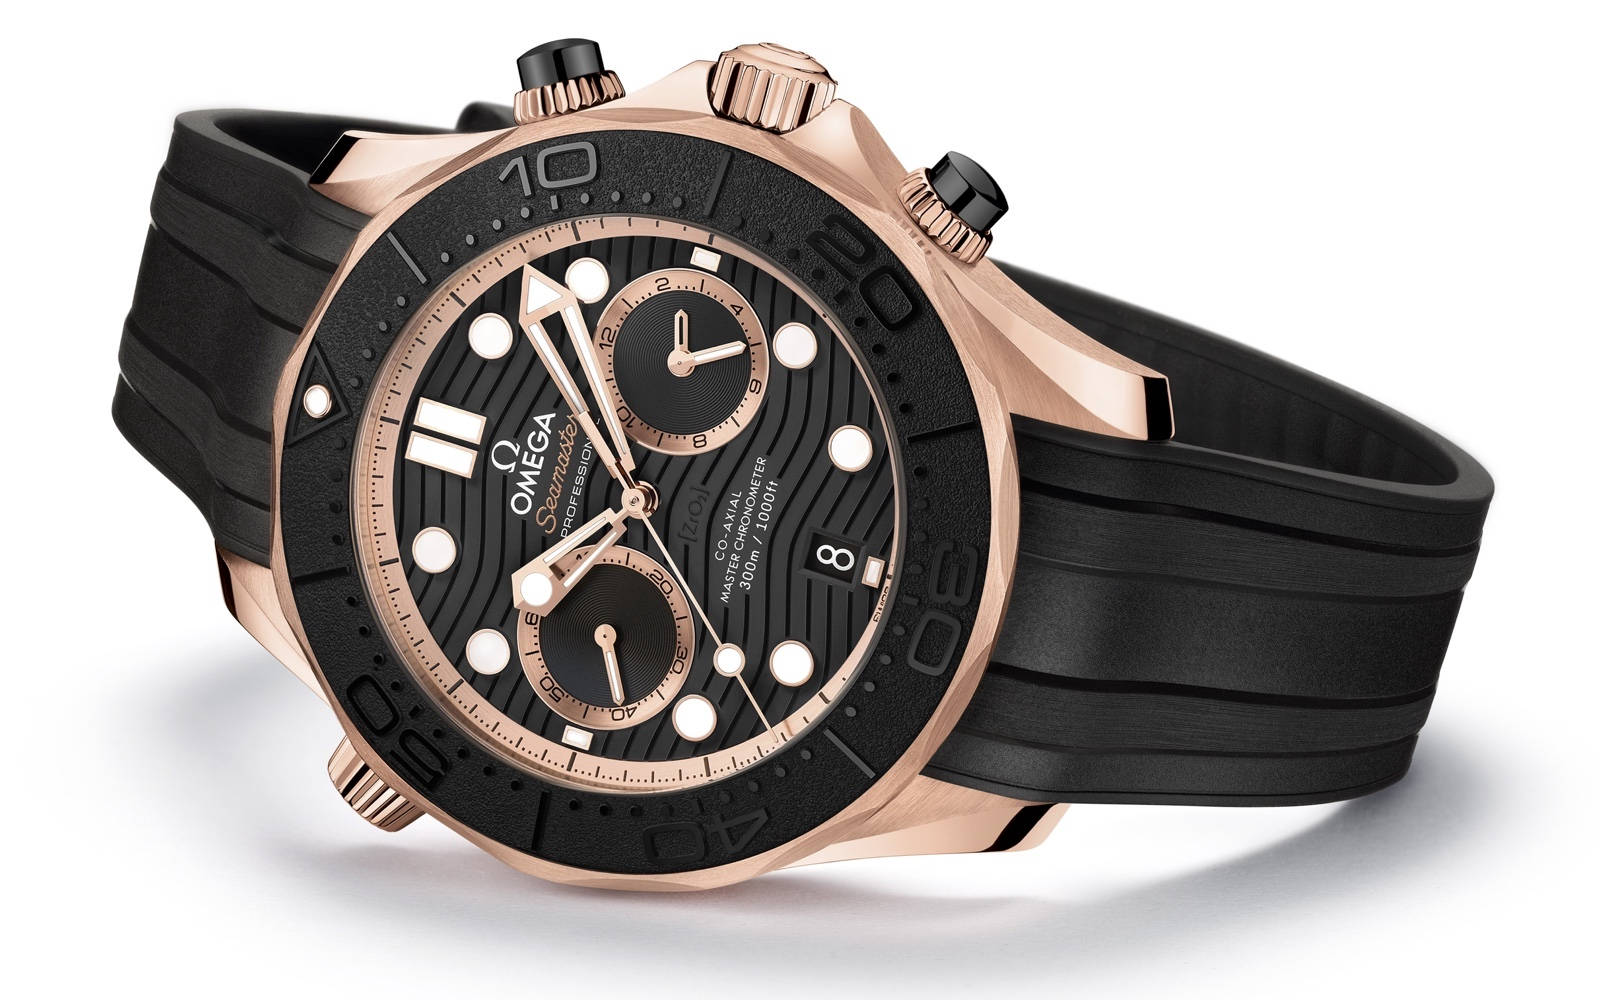 Omega Seamaster Diver 300M Chronograph Sedna Gold 2